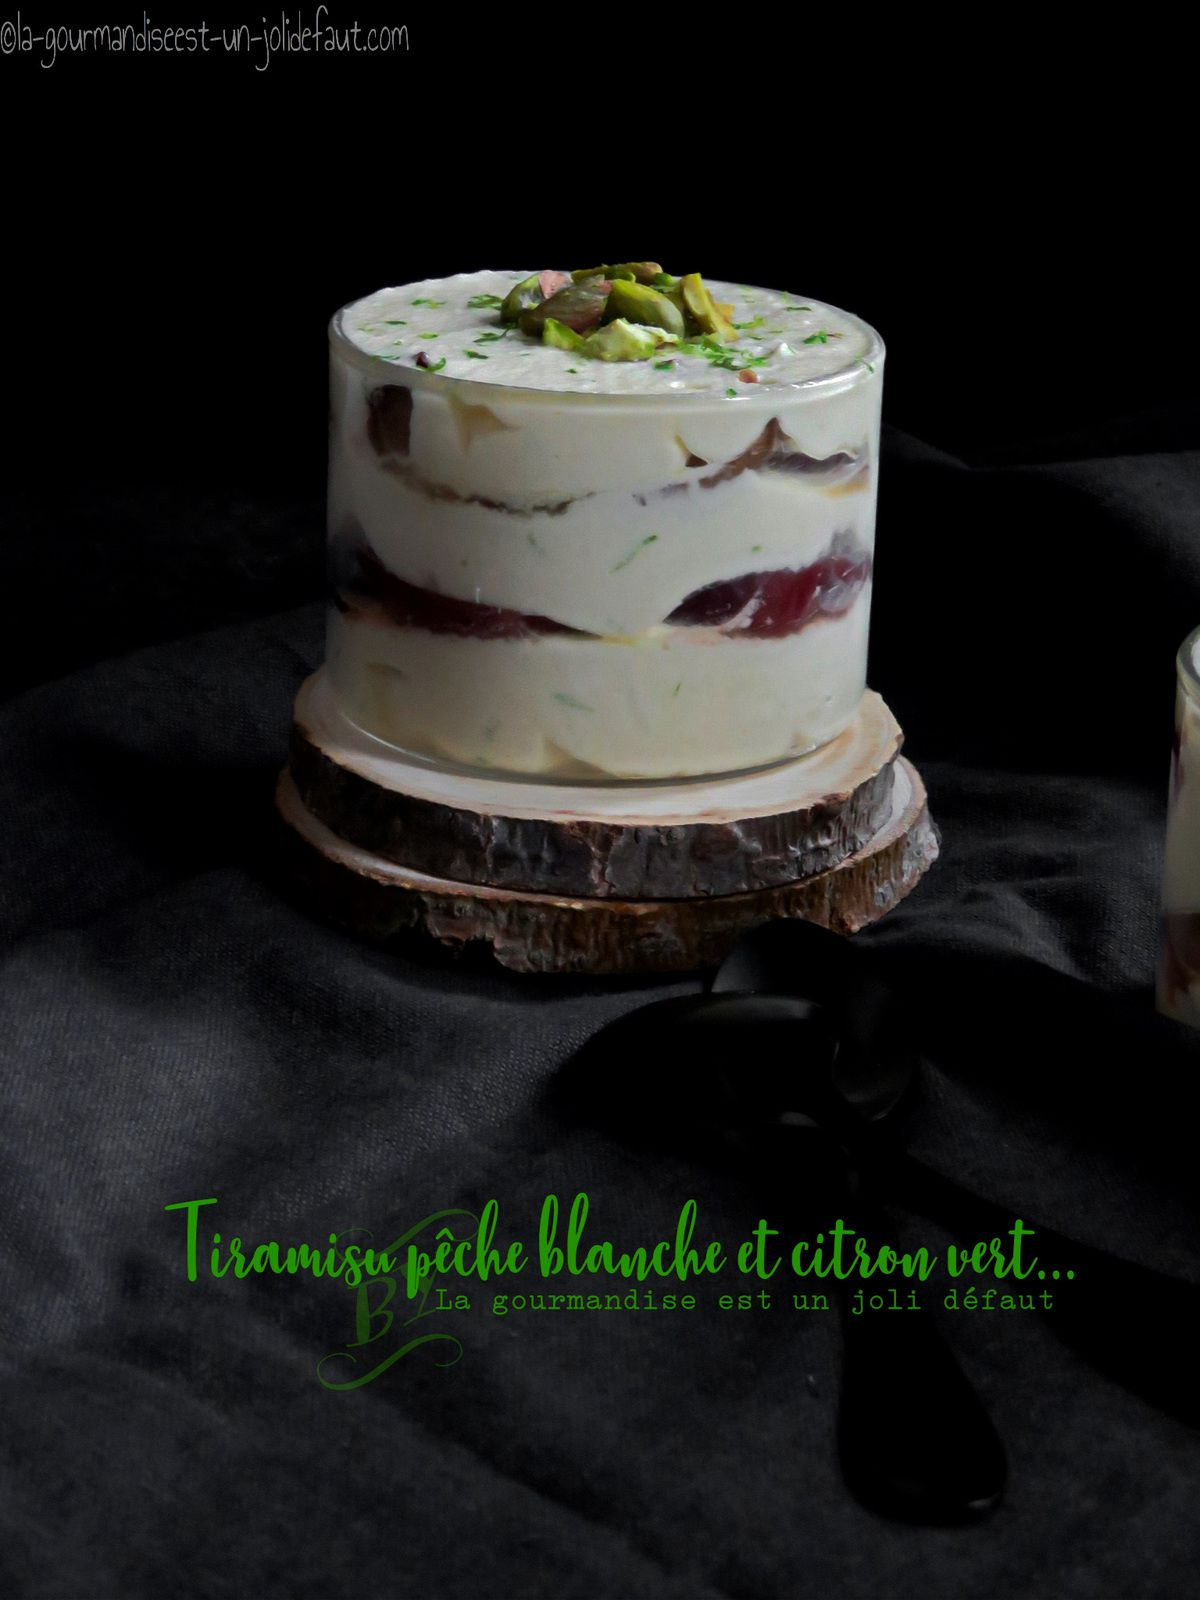 Tiramisu aux pêches blanches, thym et citron vert